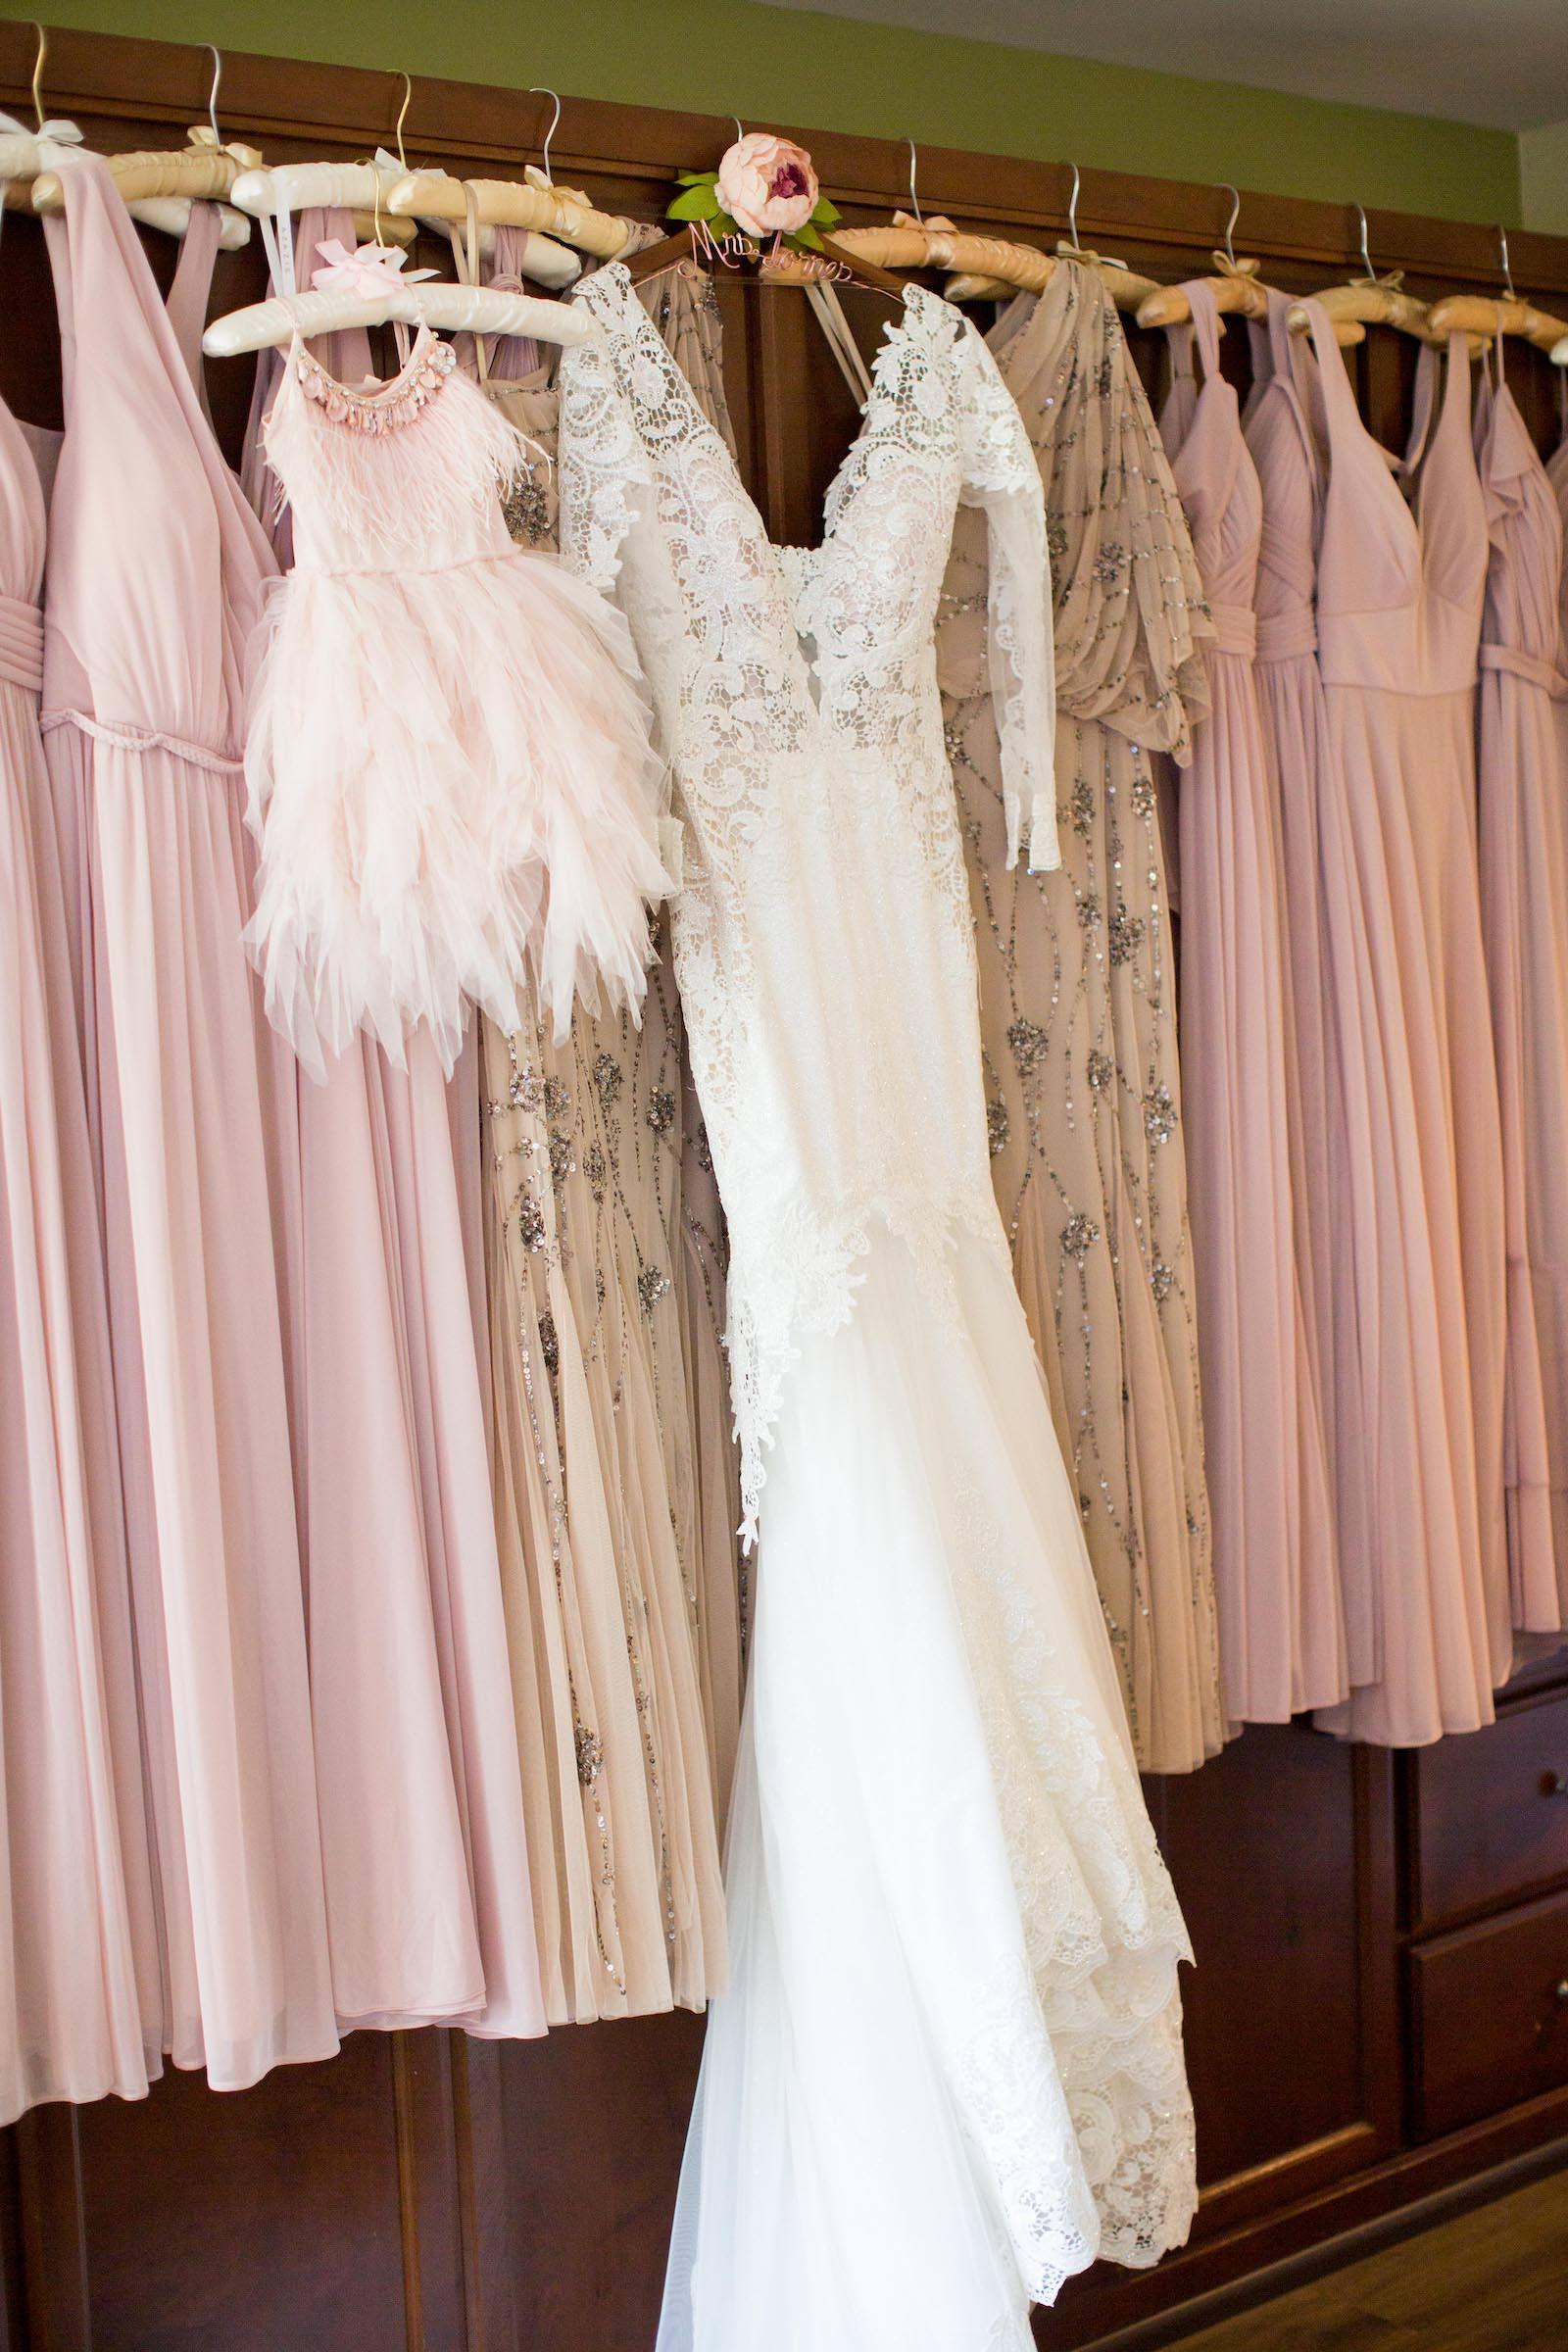 Lace Bodice Long Sleeve V Neckline Wedding Dress, Blush Pink Flower Girl Dress, Bridesmaids Dresses Hanging